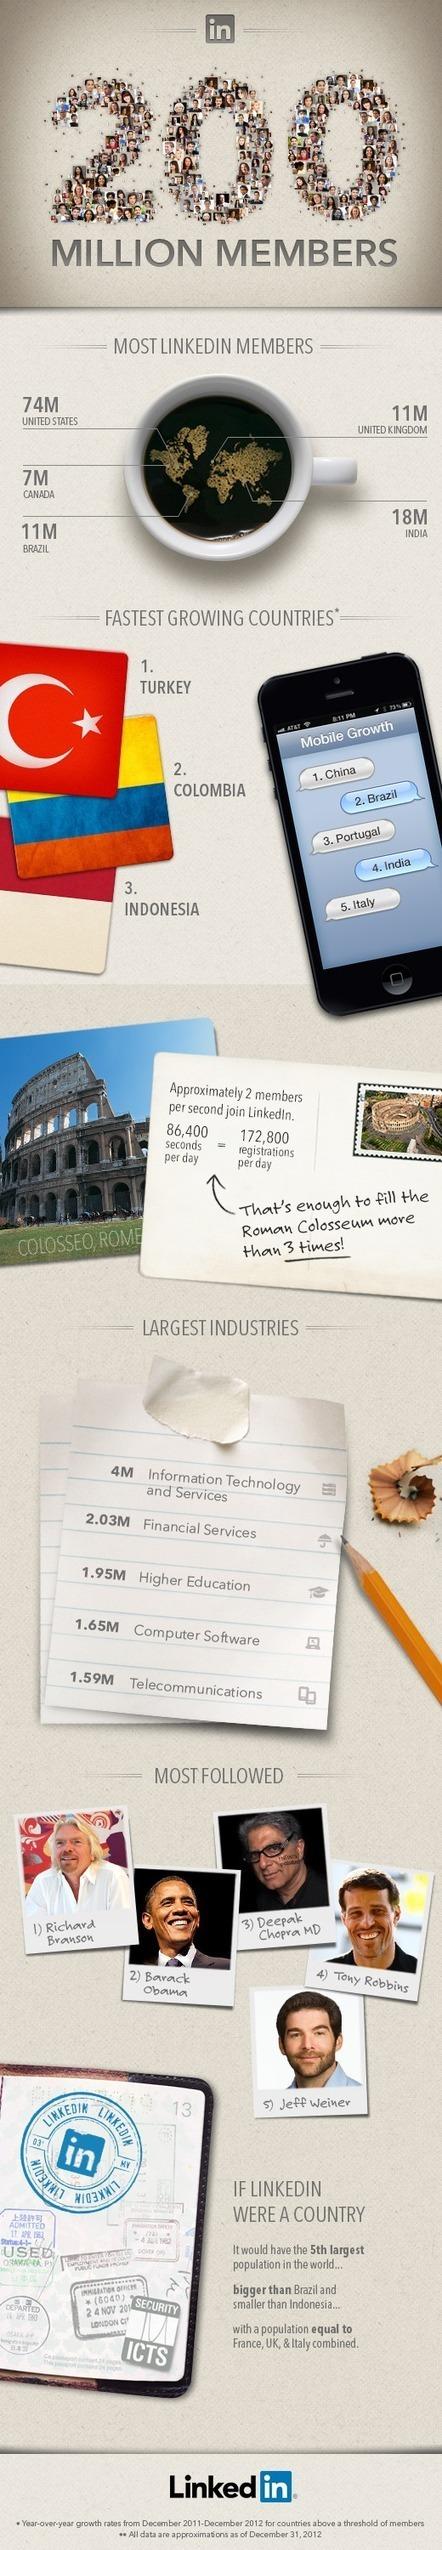 LinkedIn's 200 Million Members [INFOGRAPHIC] | LinkedIn's 200 Million Members [INFOGRAPHIC] | Scoop.it